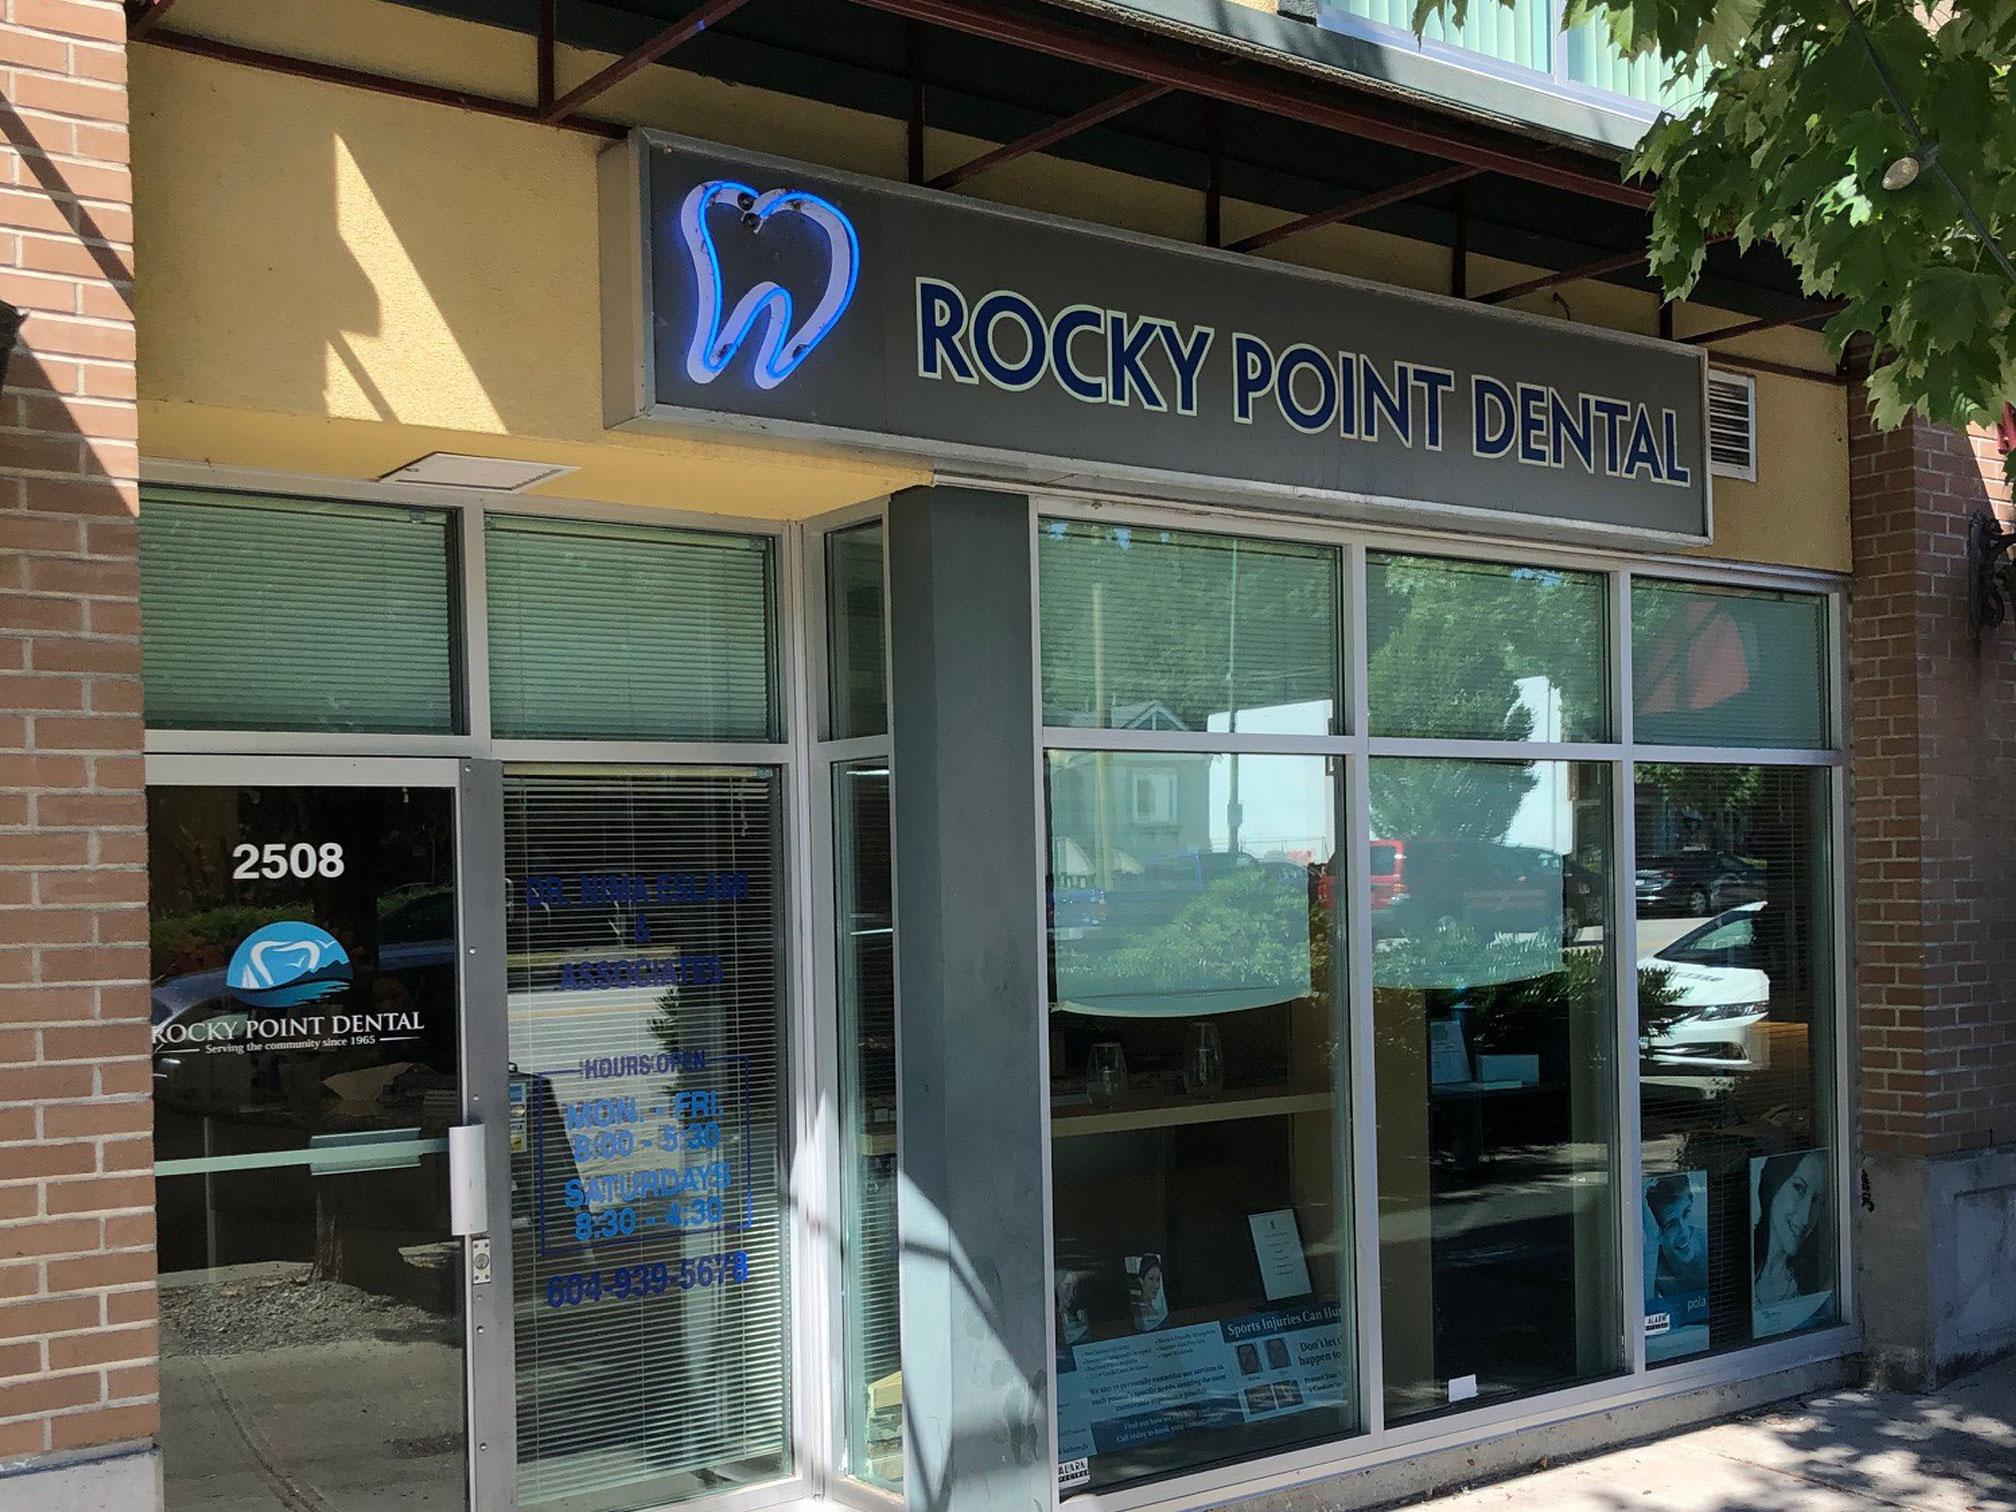 Rocky Point Dental Exterior